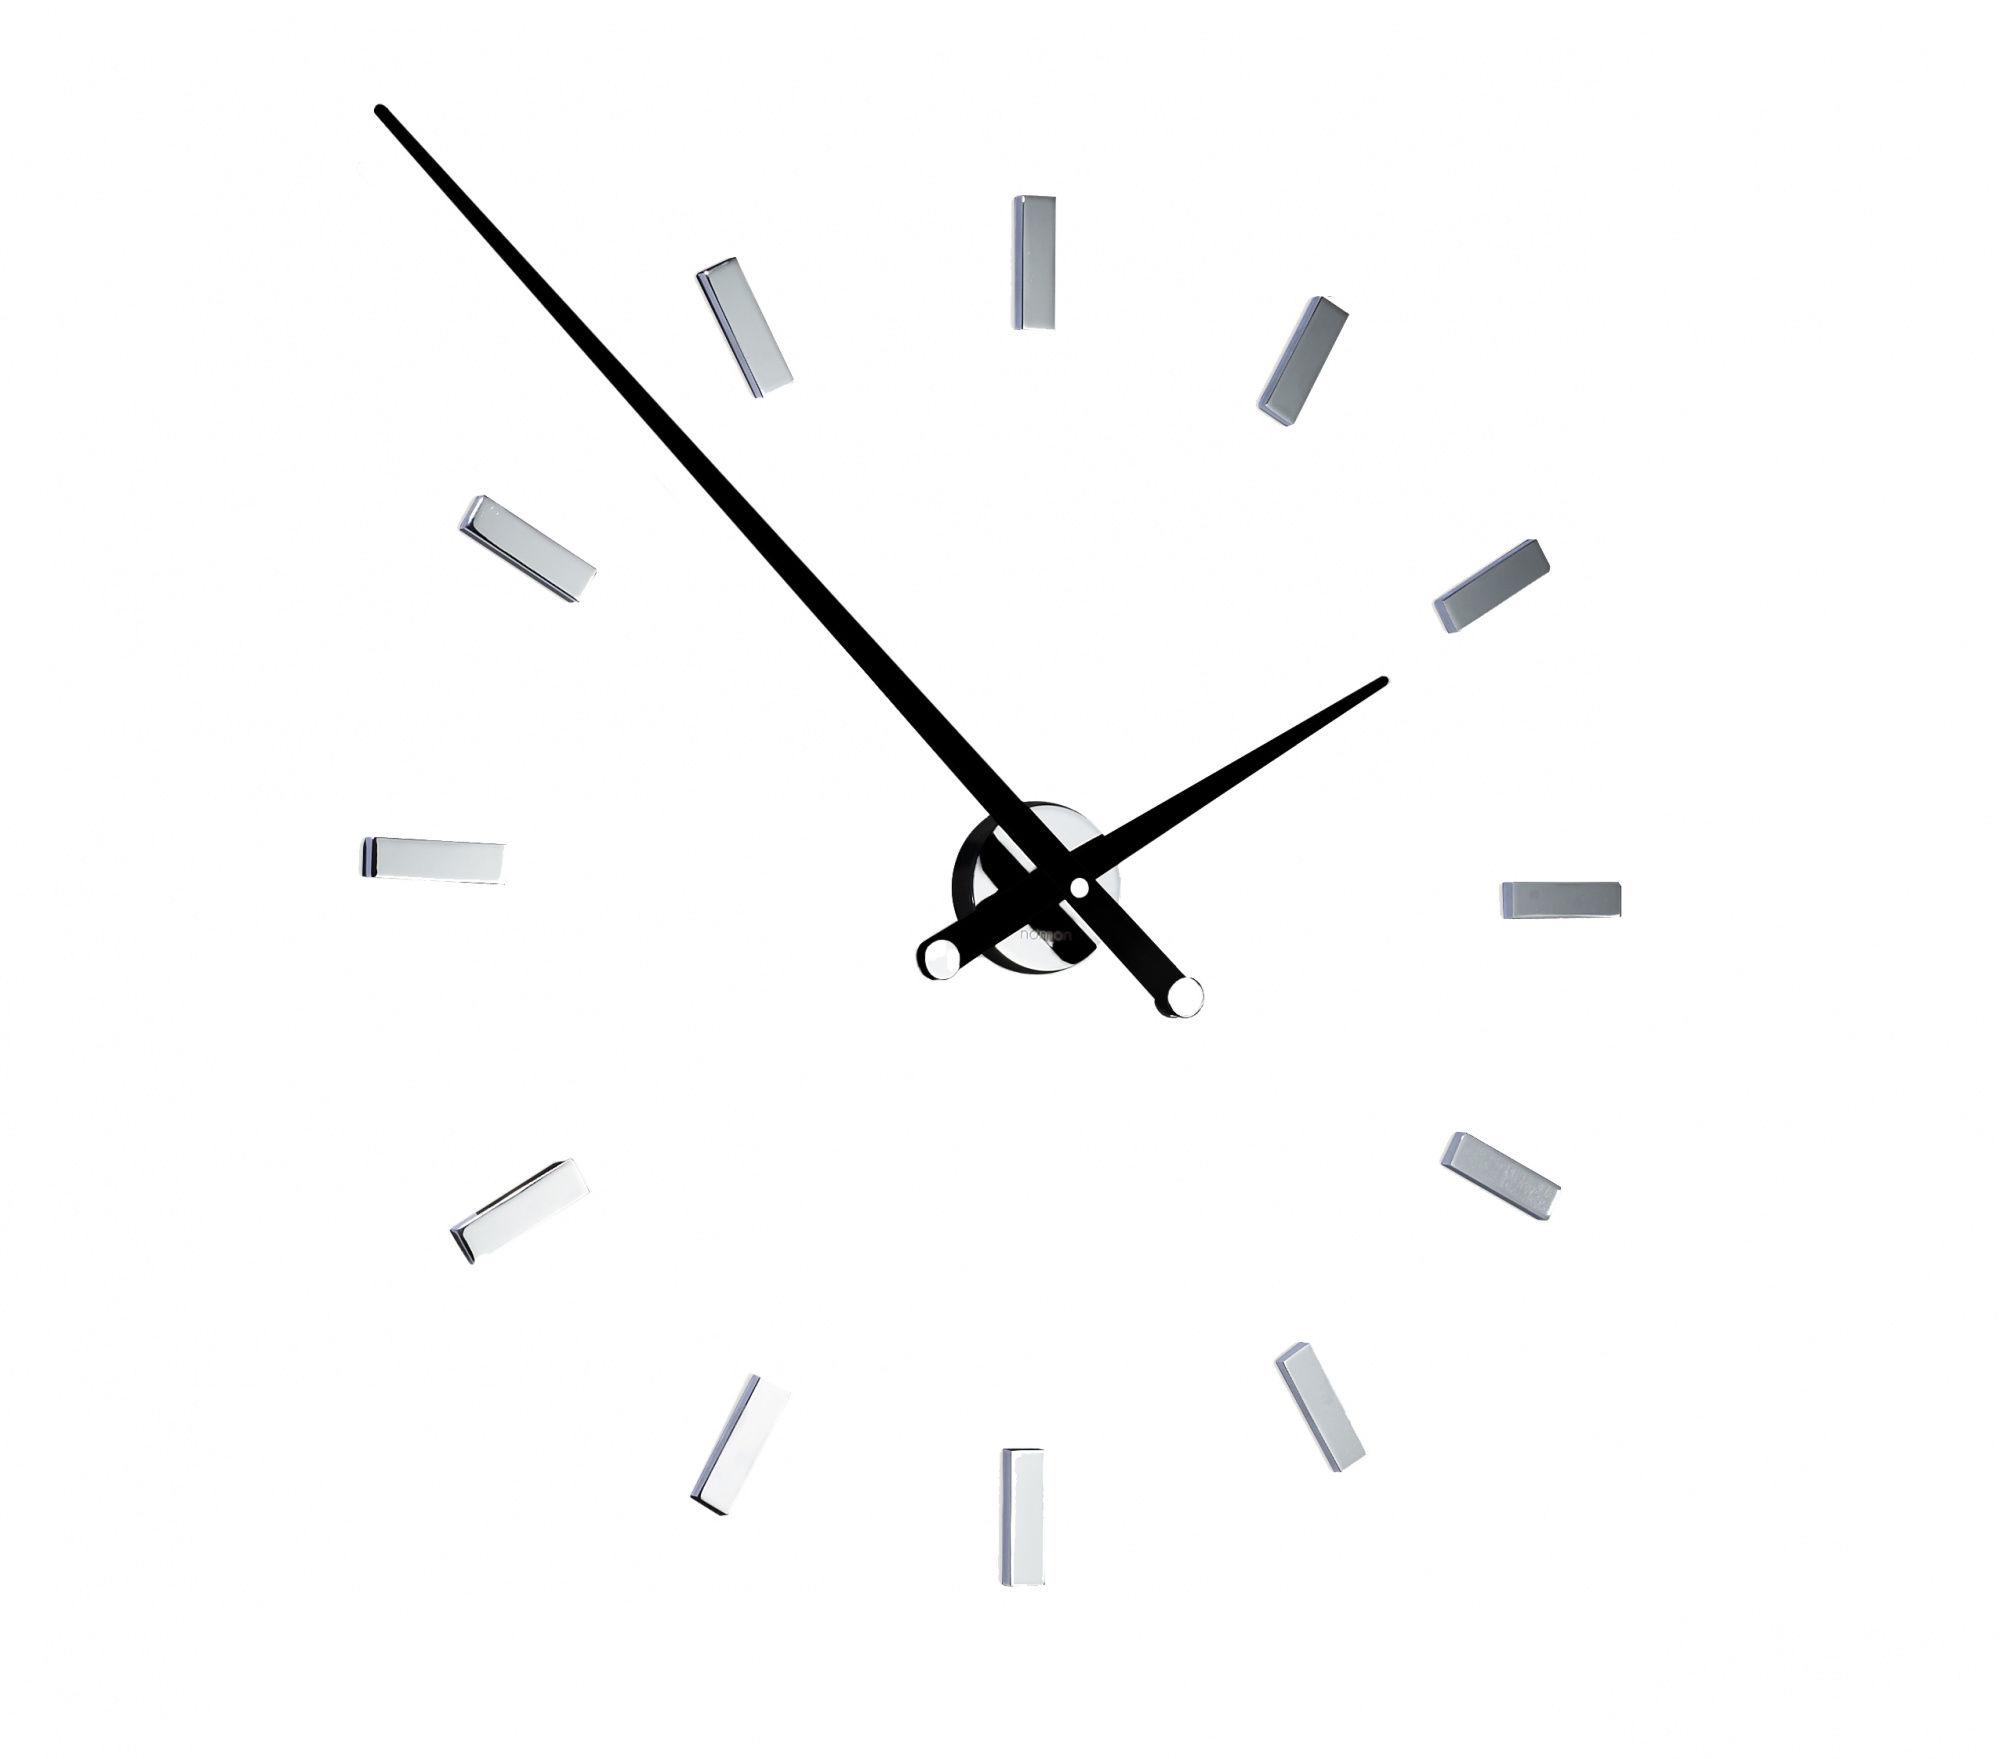 Zegar ścienny Tacón L 12sh Nomon różne kolory